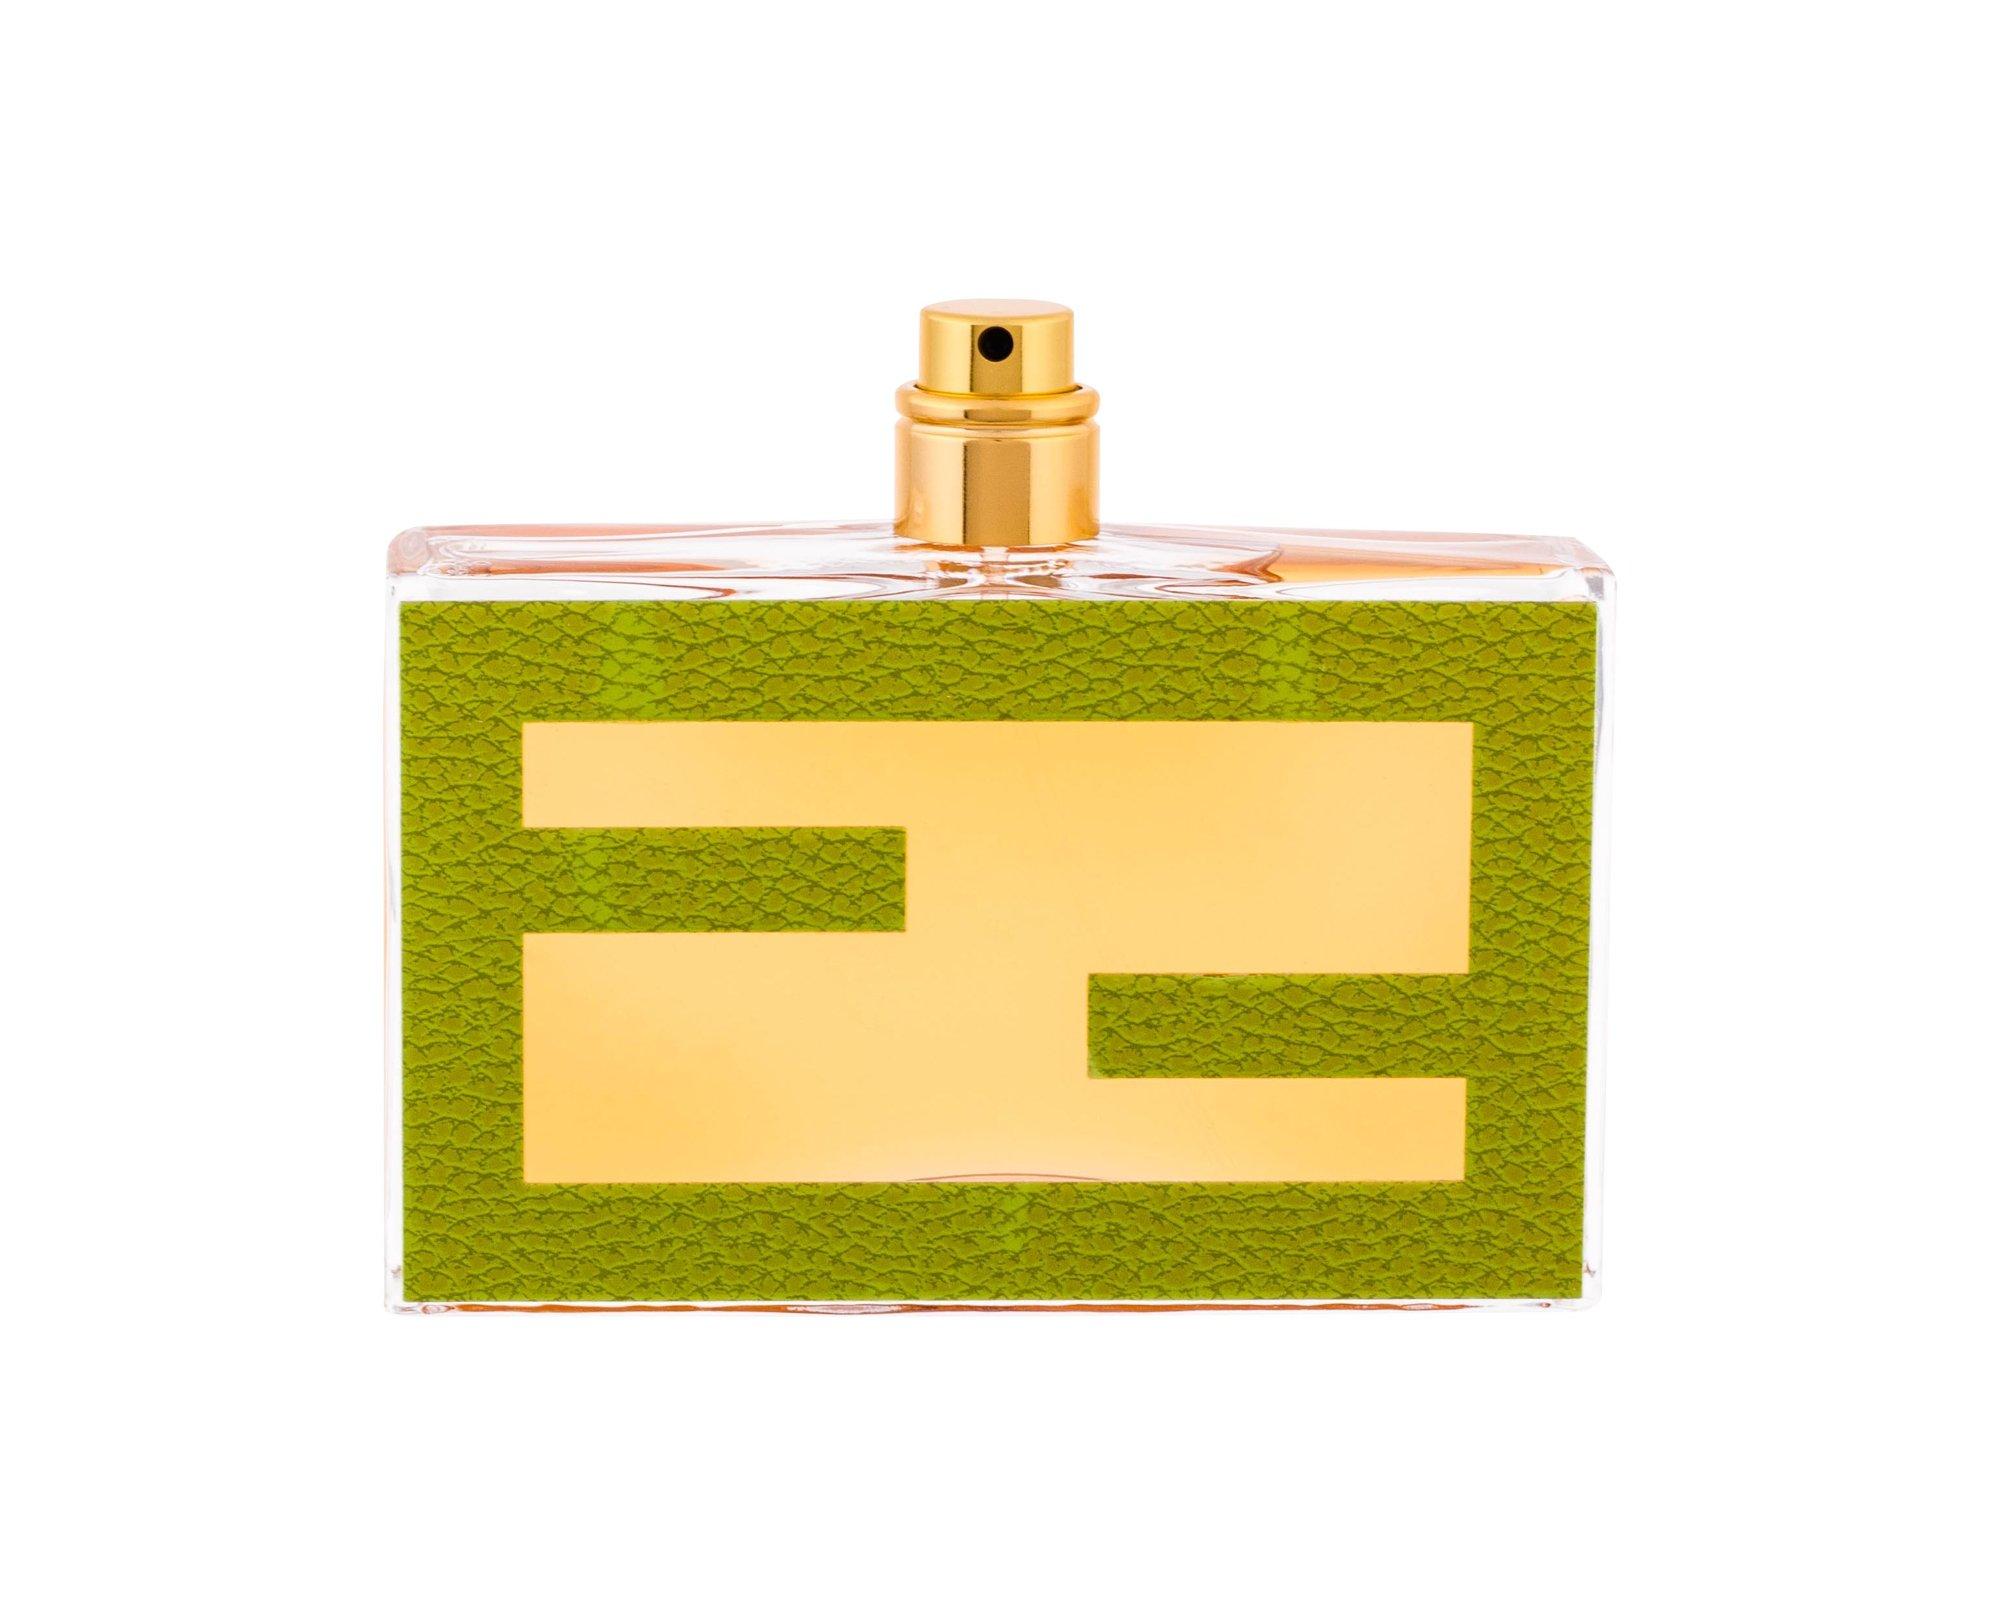 Fendi Fan di Fendi Leather Essence Eau de Parfum 75ml